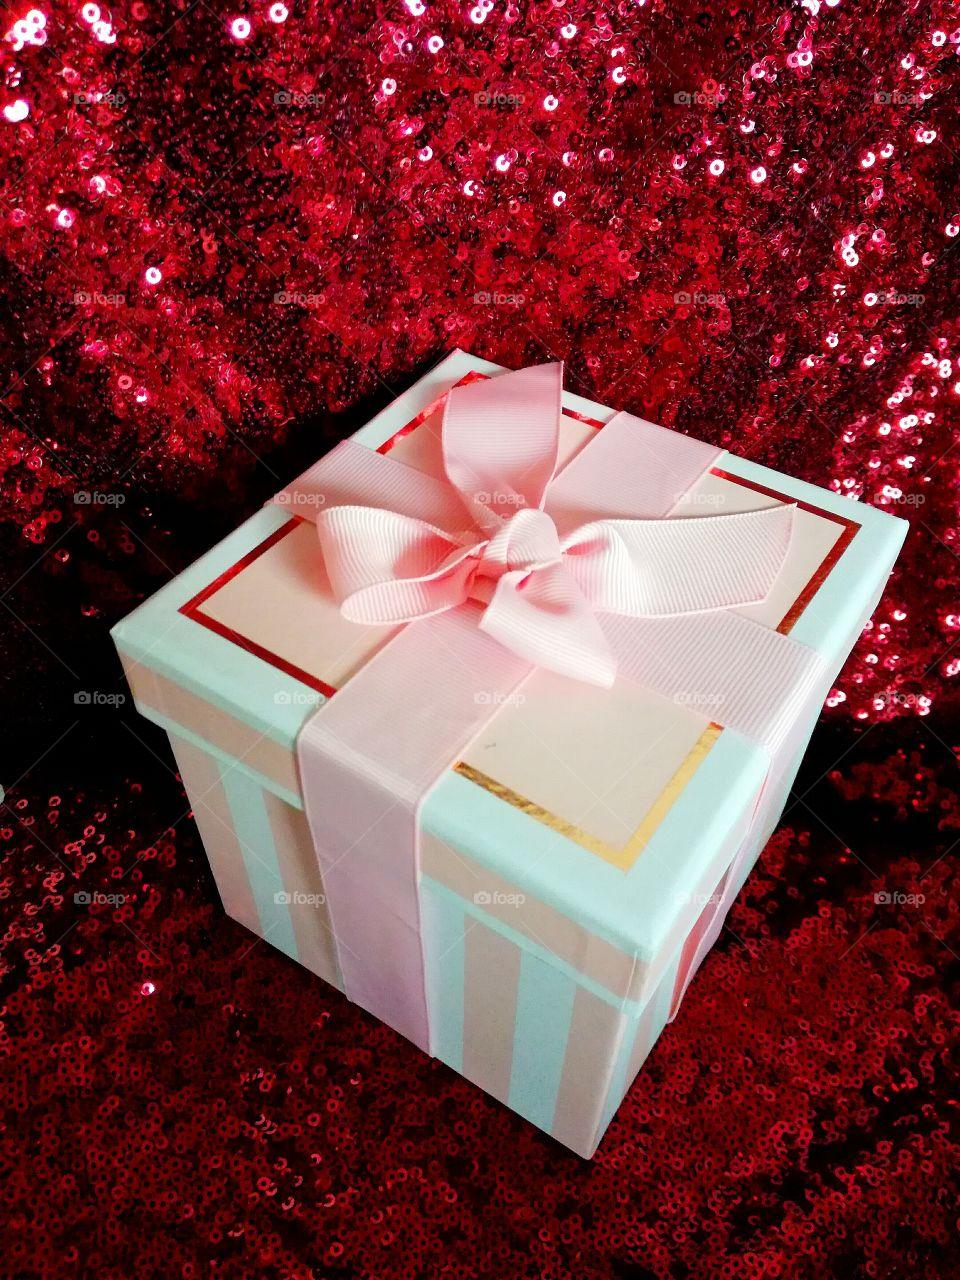 Close-up of a gift box